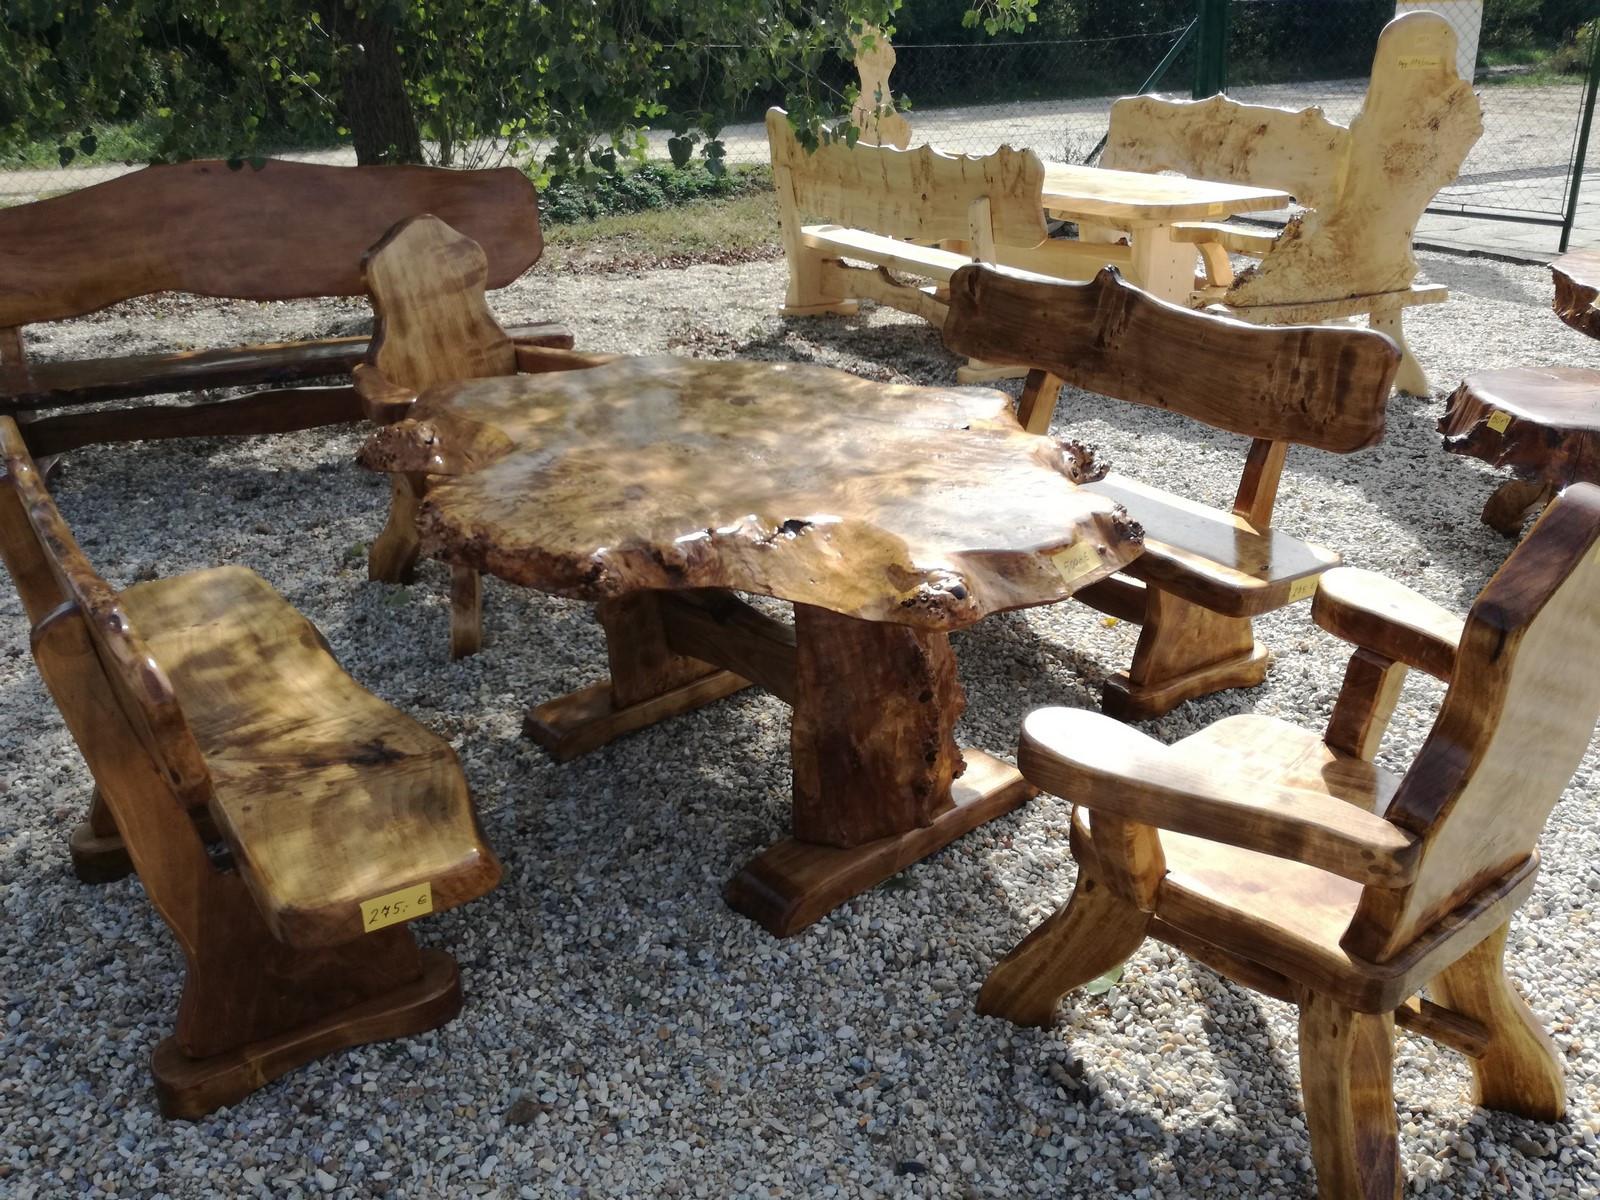 rustikale einzigartige sitzgarnituren aus massivholz. Black Bedroom Furniture Sets. Home Design Ideas